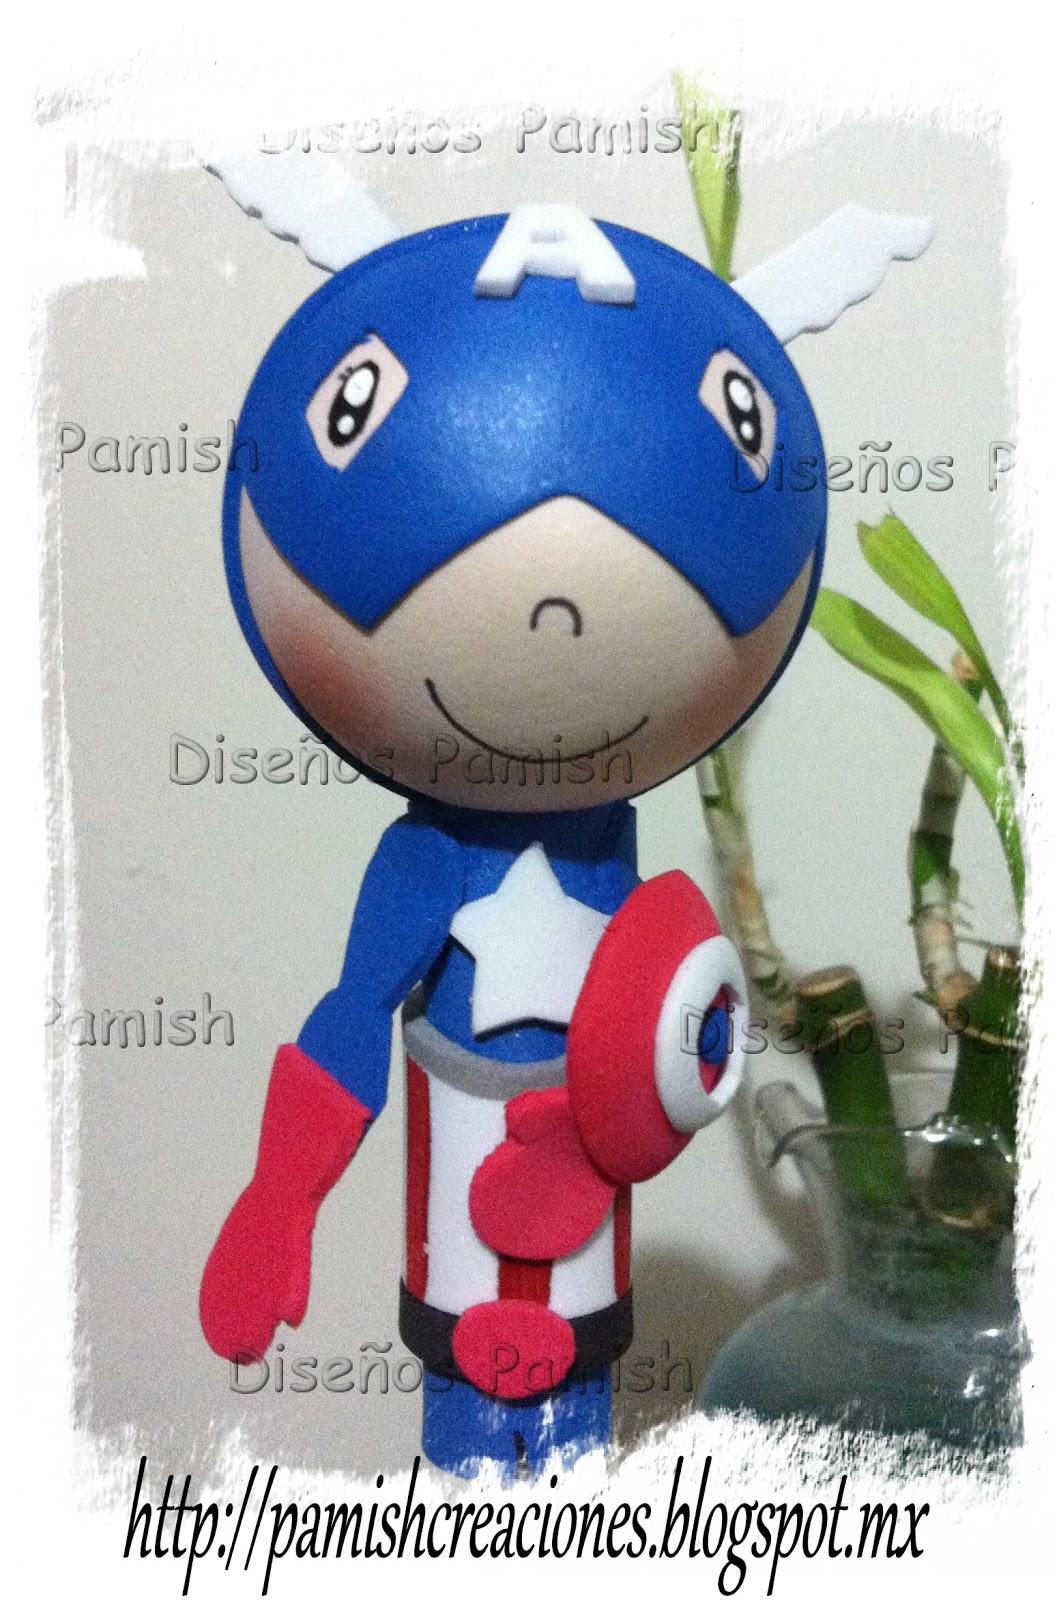 Diseños Pamish: Capitan America